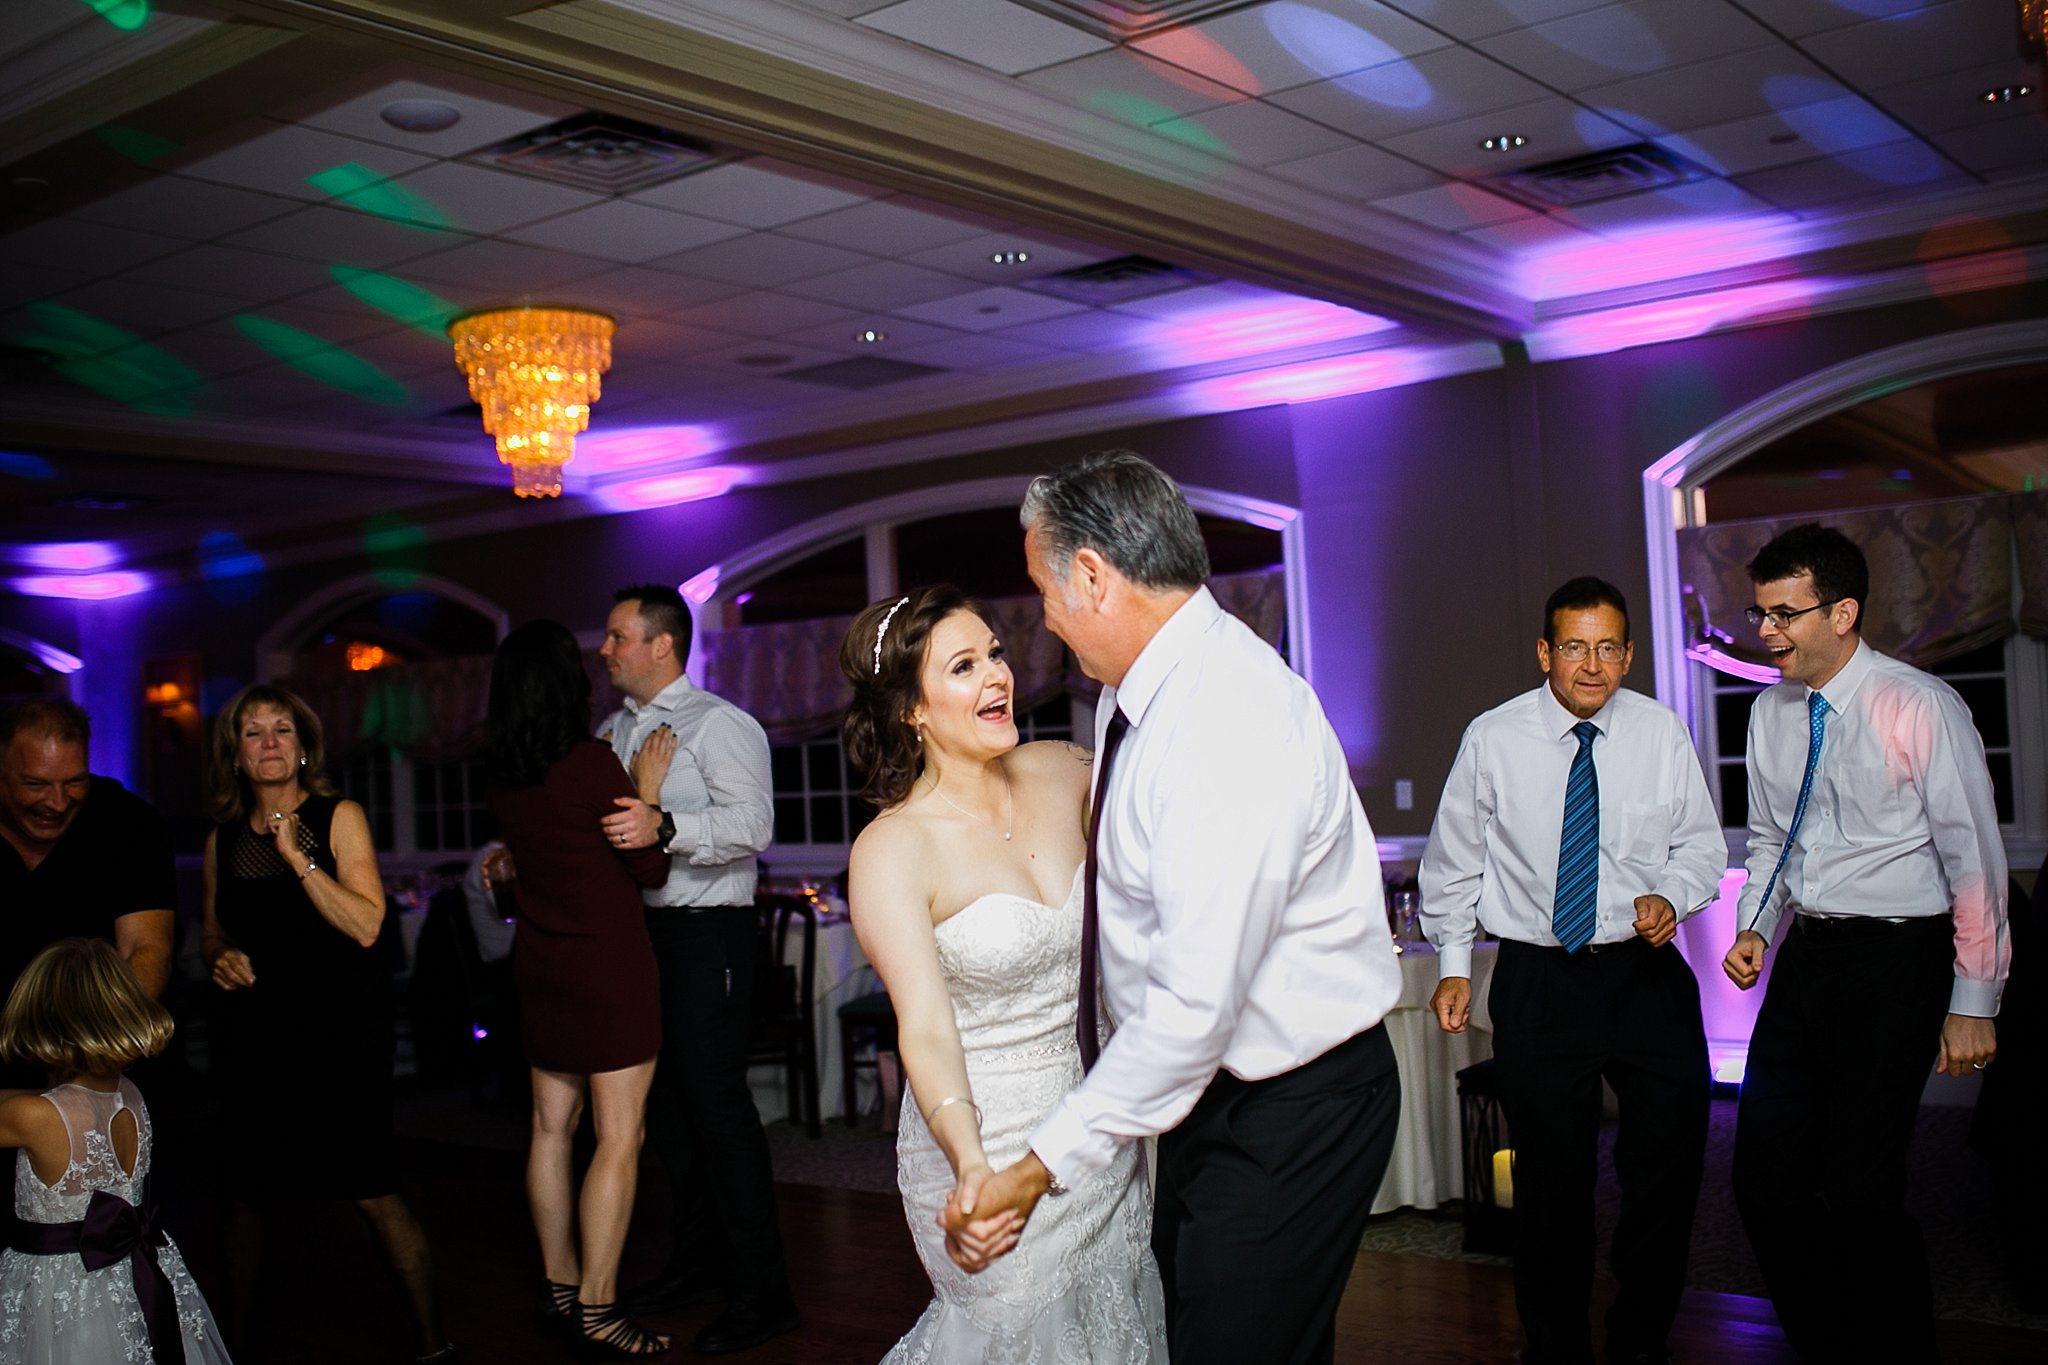 Links at Unionvale Wedding Lagrangeville Wedding Hudson Valley Wedding Photographer Sweet Alice Photography69.jpg